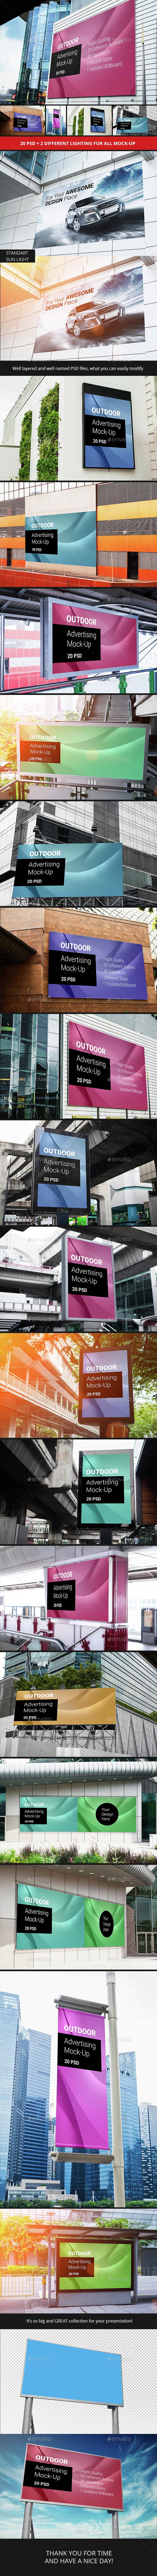 Billboard Outdoor Advertising Mock-Up - Print Product Mock-Ups